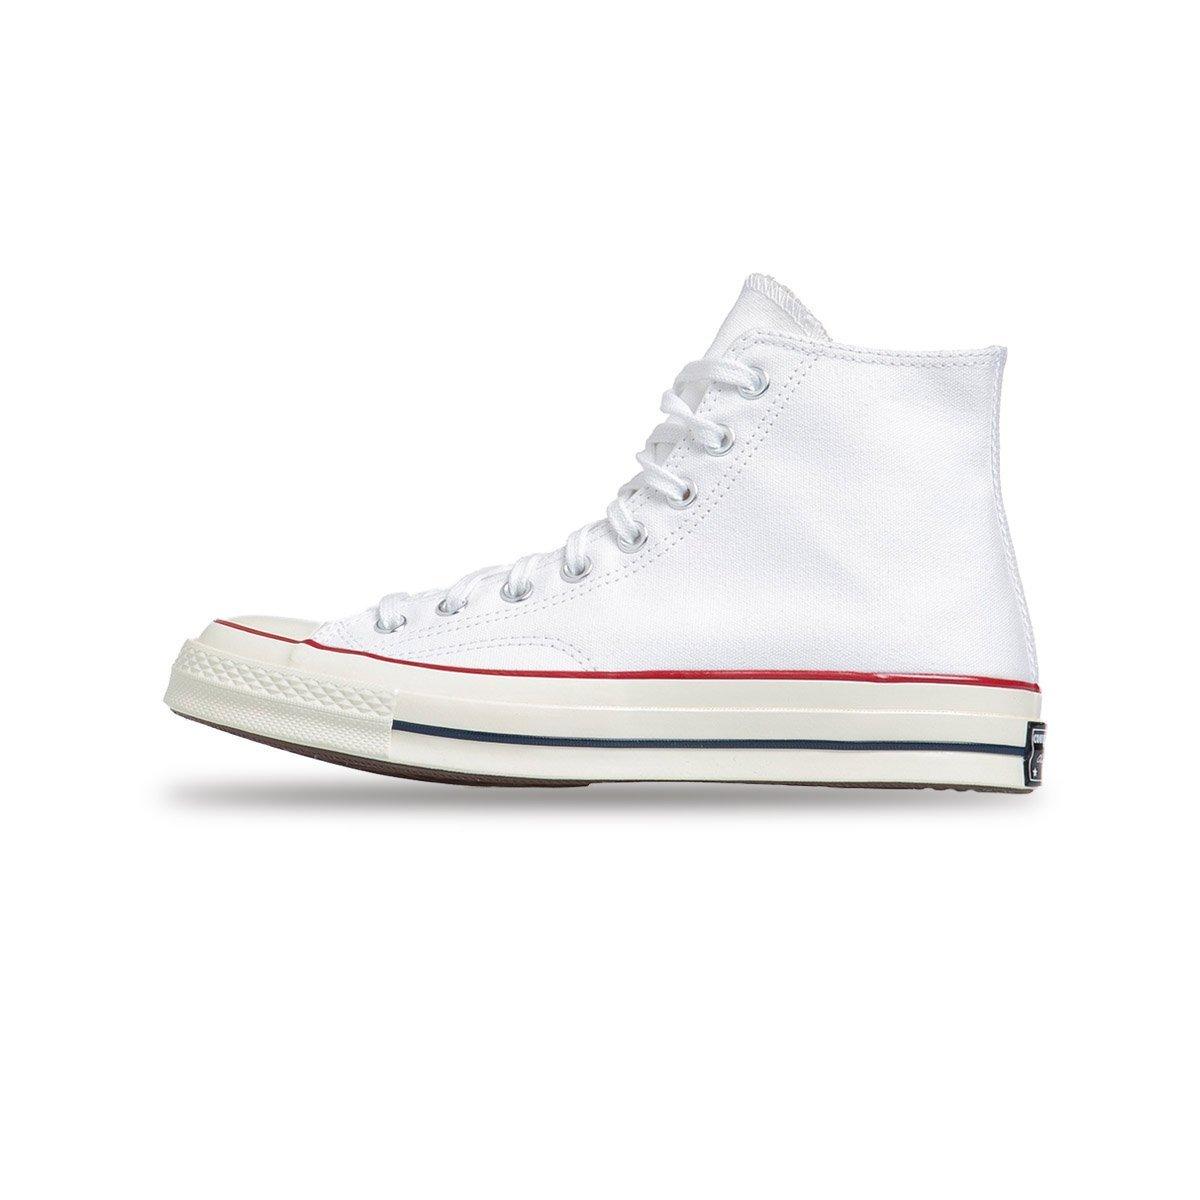 Sneakers buty Converse Chuck 70 Hi białe (162056C)